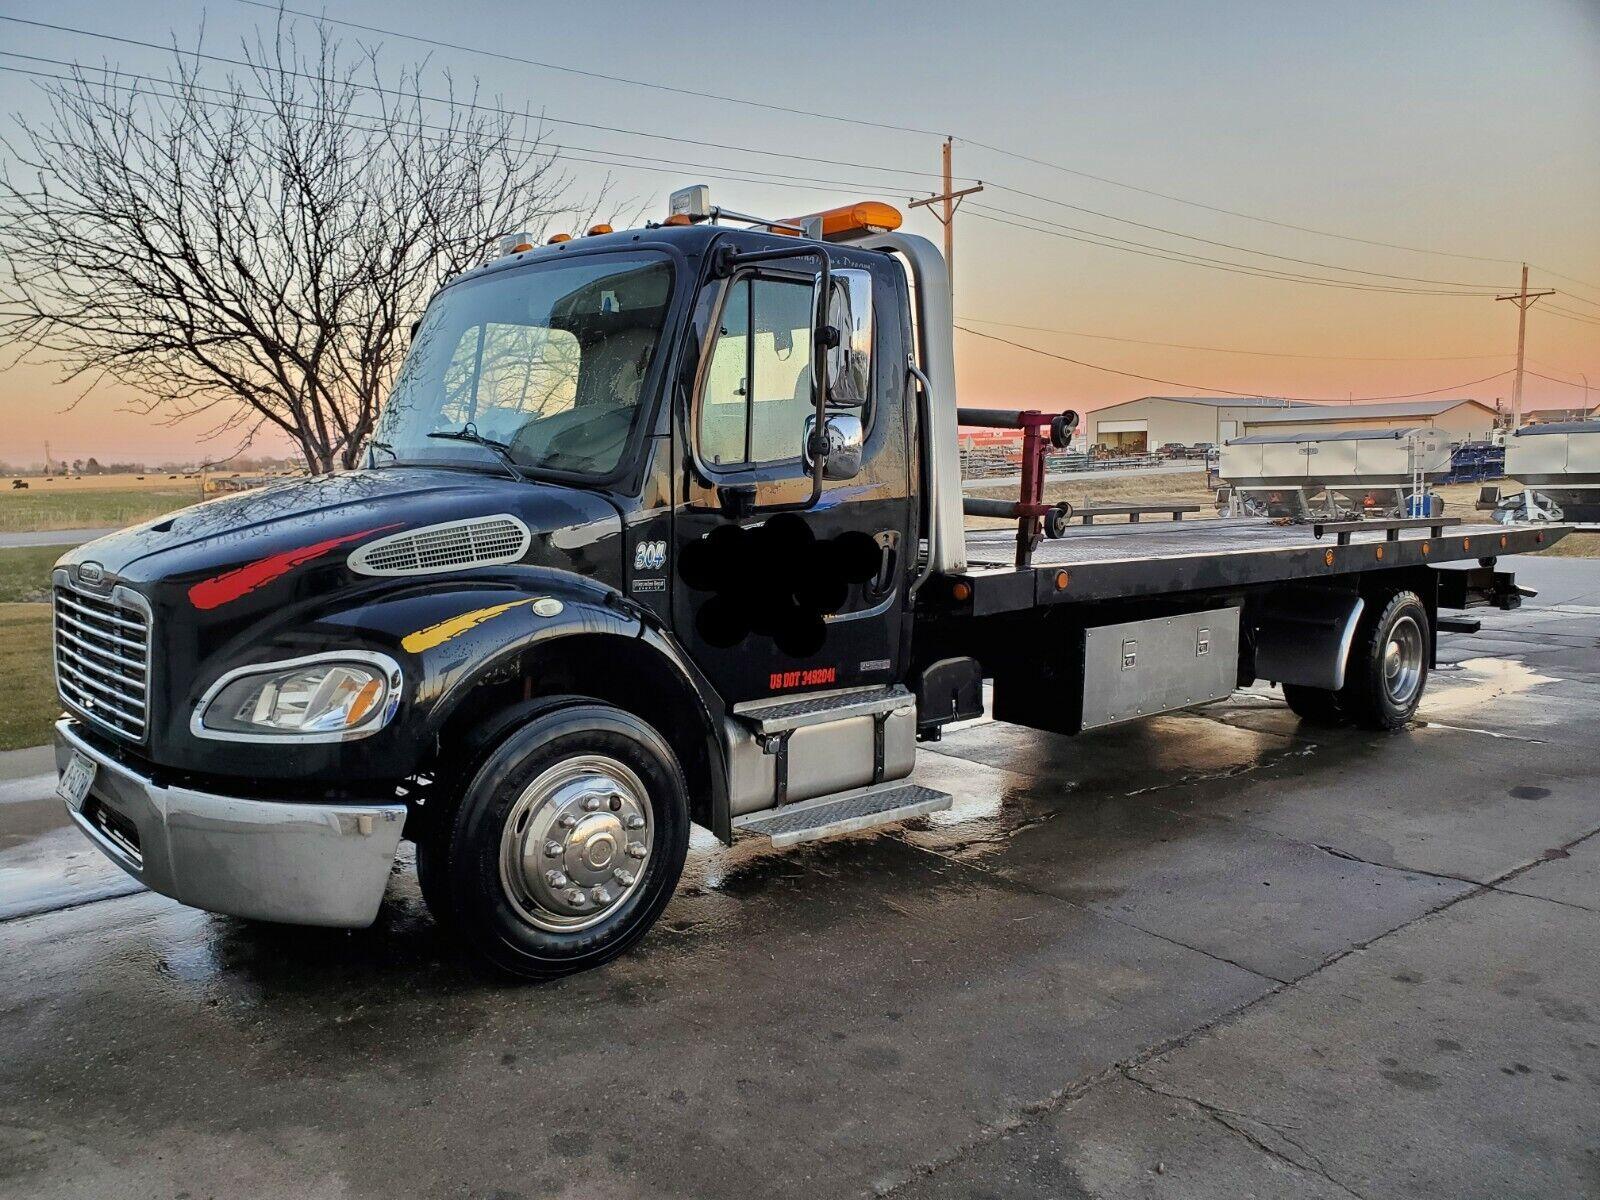 2007 Freightliner M2 Flatbed Tow Truck wrecker